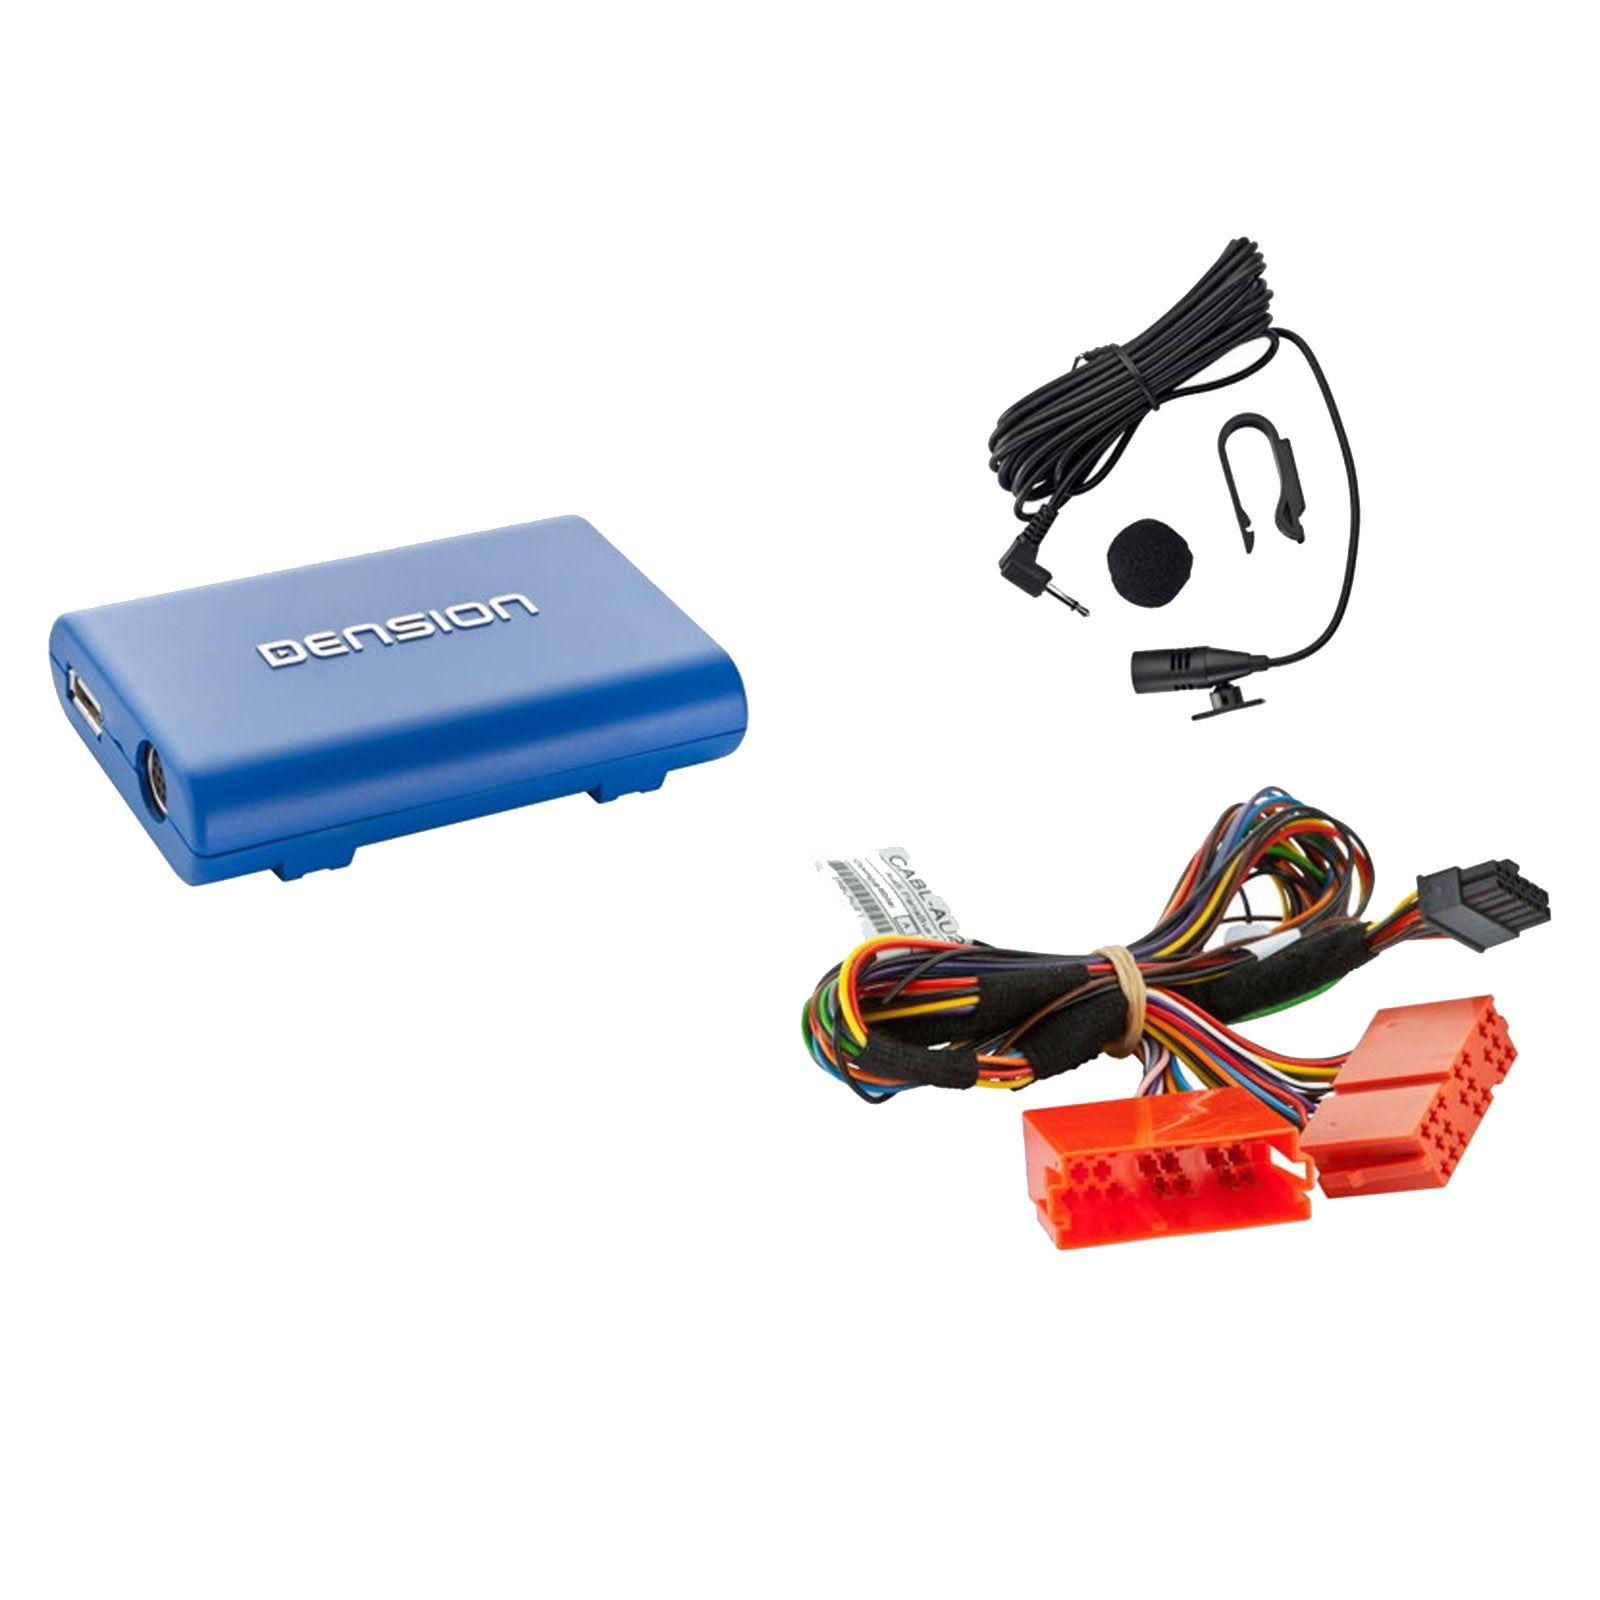 DENSION Lite3 BT HF sada + iPhone / iPod / USB vstup AUDI / SEAT - GBL3AU2 4CARMEDIA - Autoradia-Hifi.cz